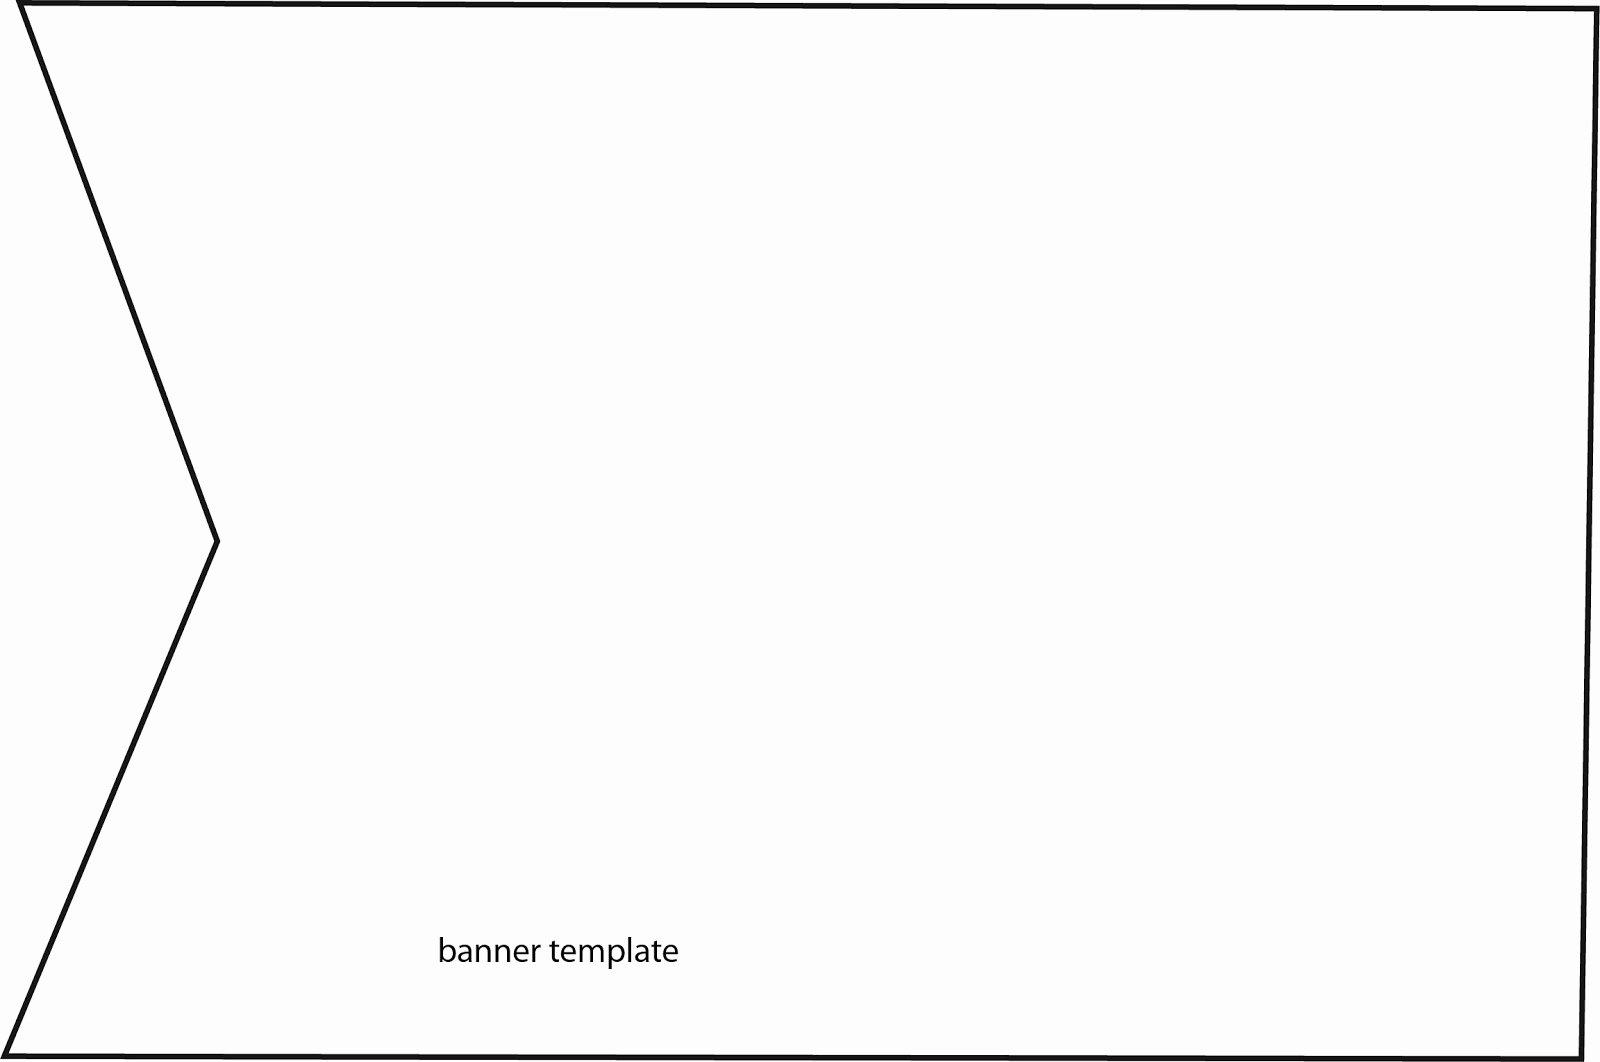 Free Printable Banner Template Awesome Bobunny 5 26 13 6 2 13